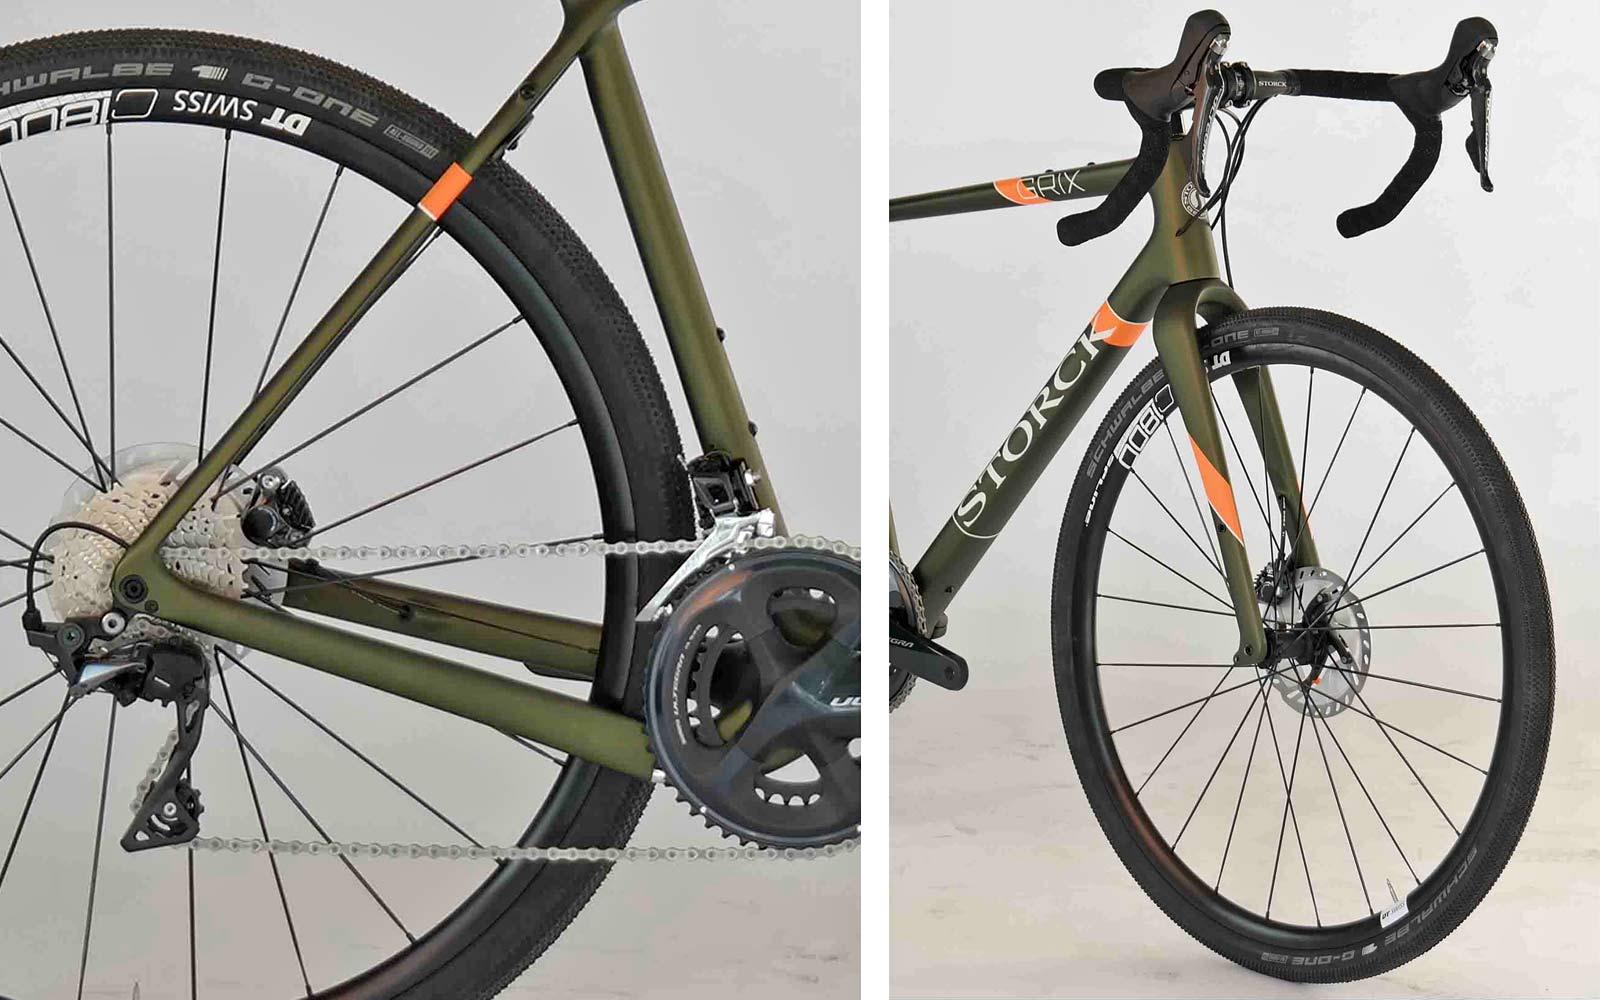 Storck GRIX Pro gravel bike, SRAM Rival eTap AXS Wide update,details